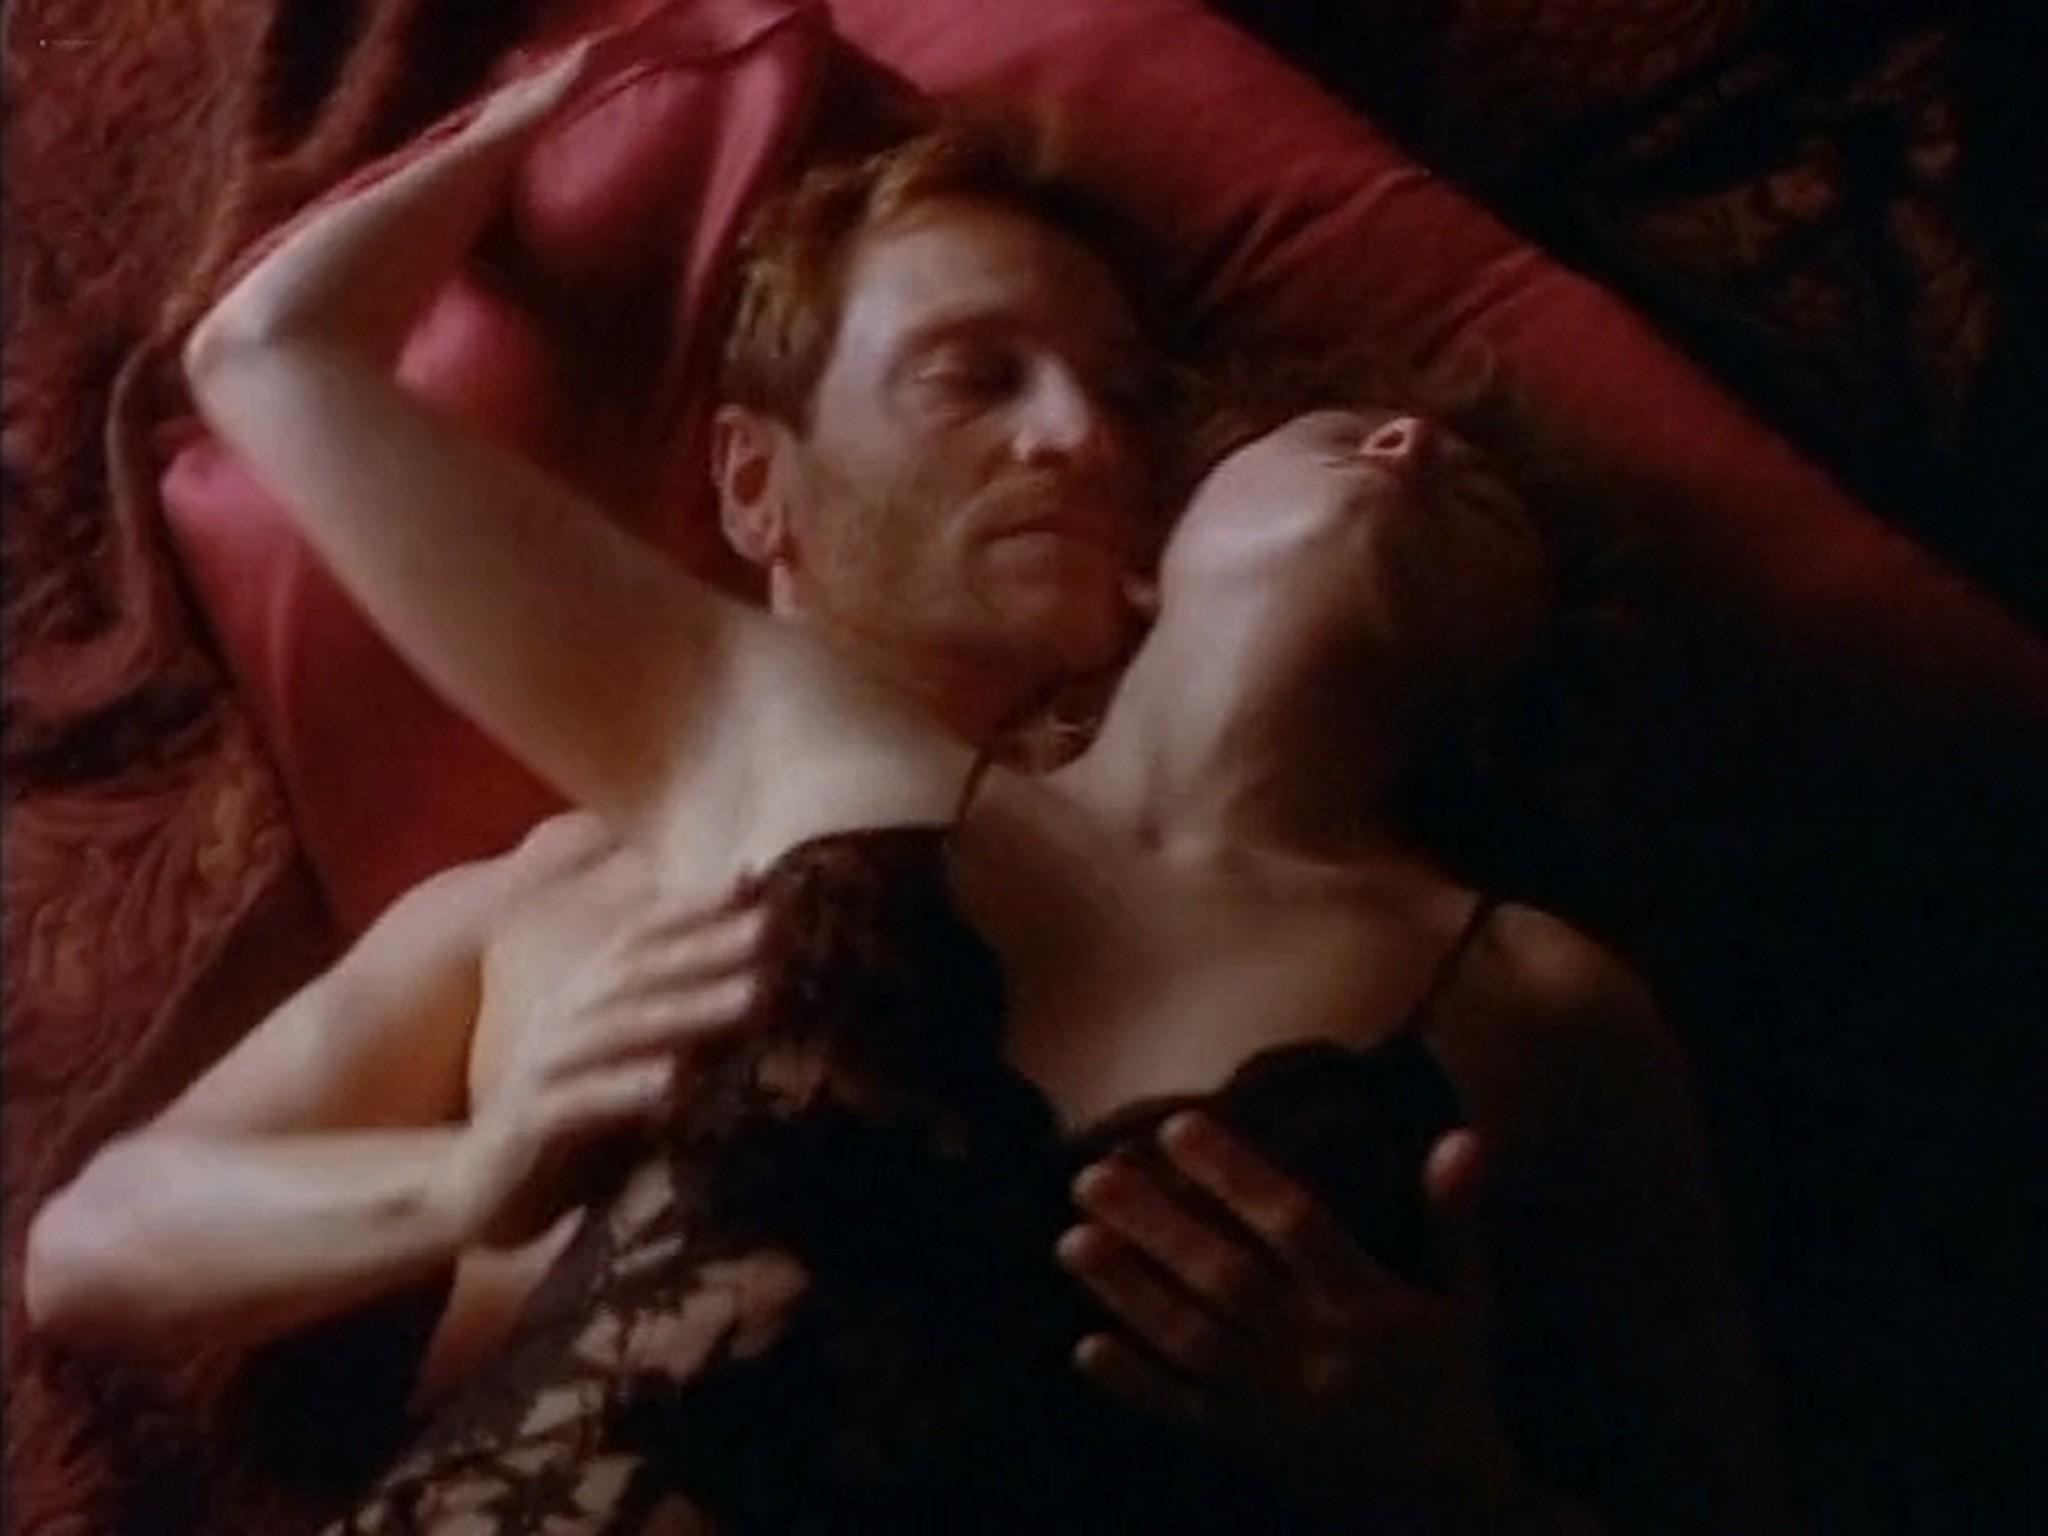 Nina Siemaszko nude sex Red Shoe Diaries Just Like That 1992 s1e5 Web 14